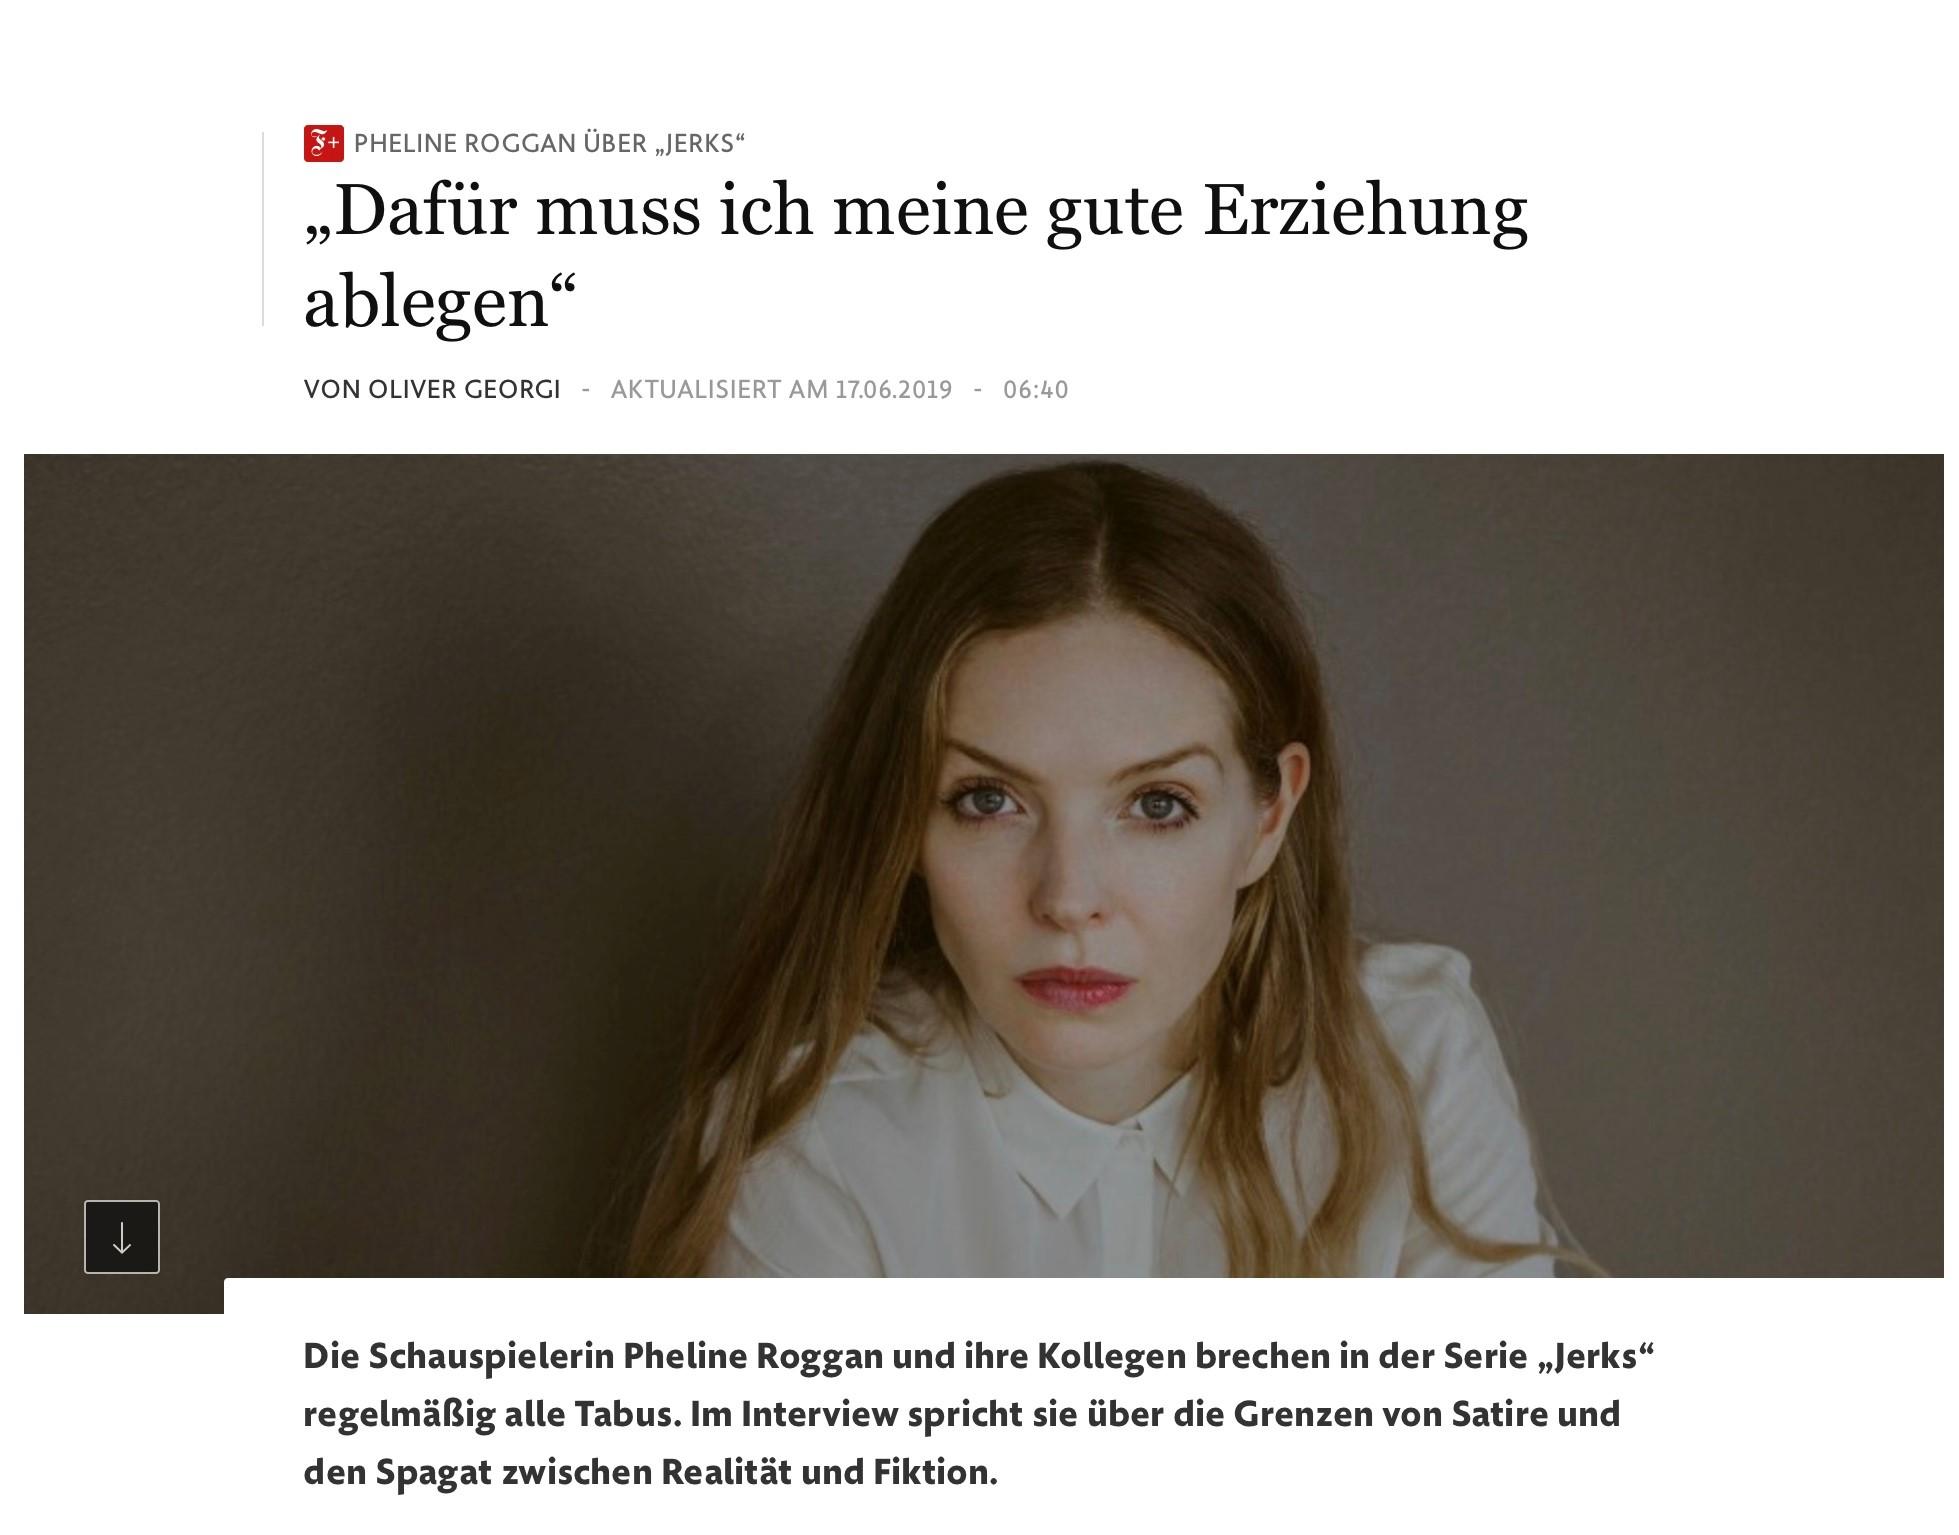 Pheline Roggan